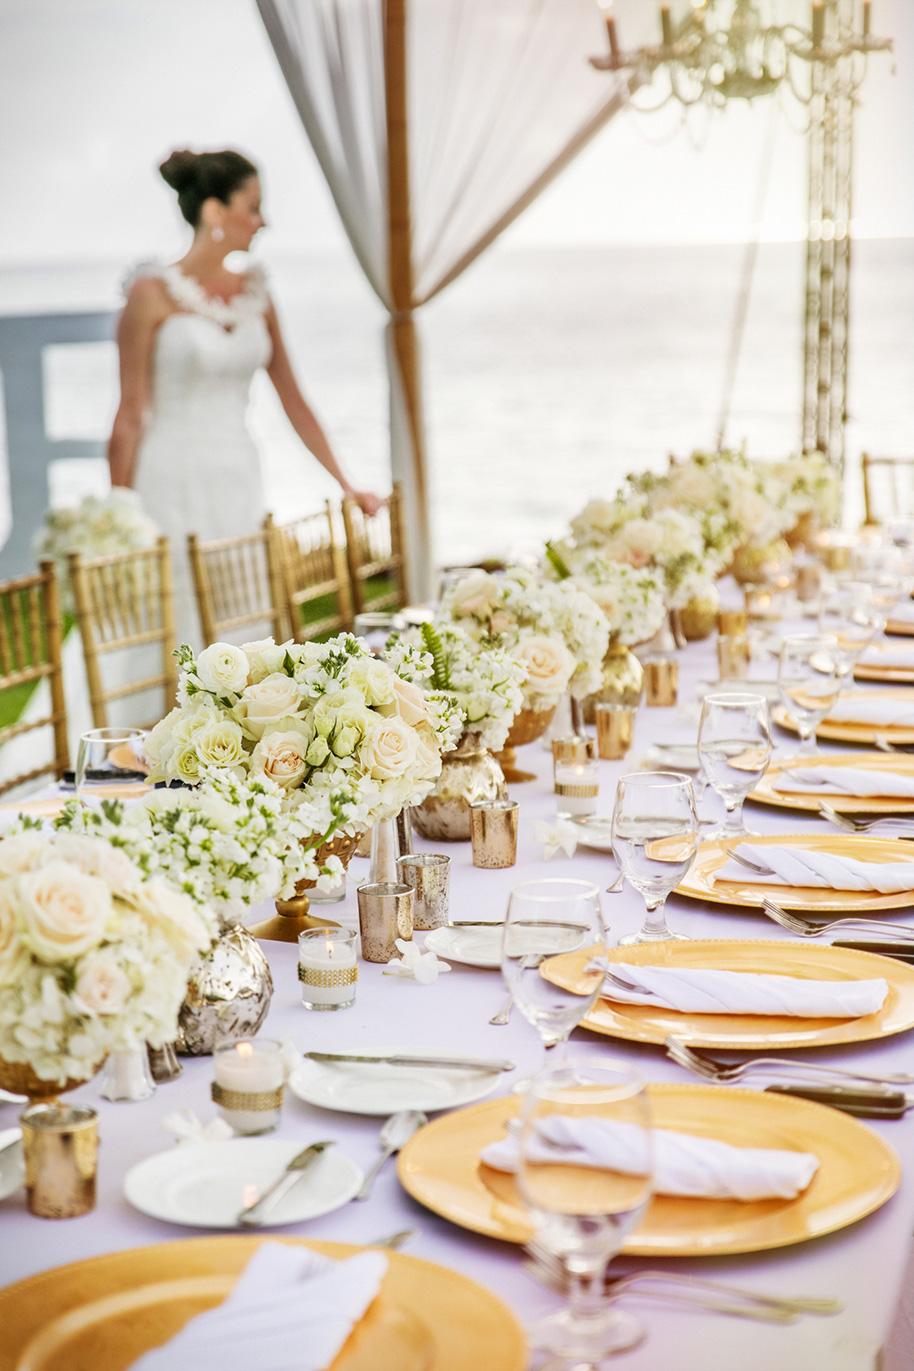 Maui-Ocean-Front-Wedding-070816-24